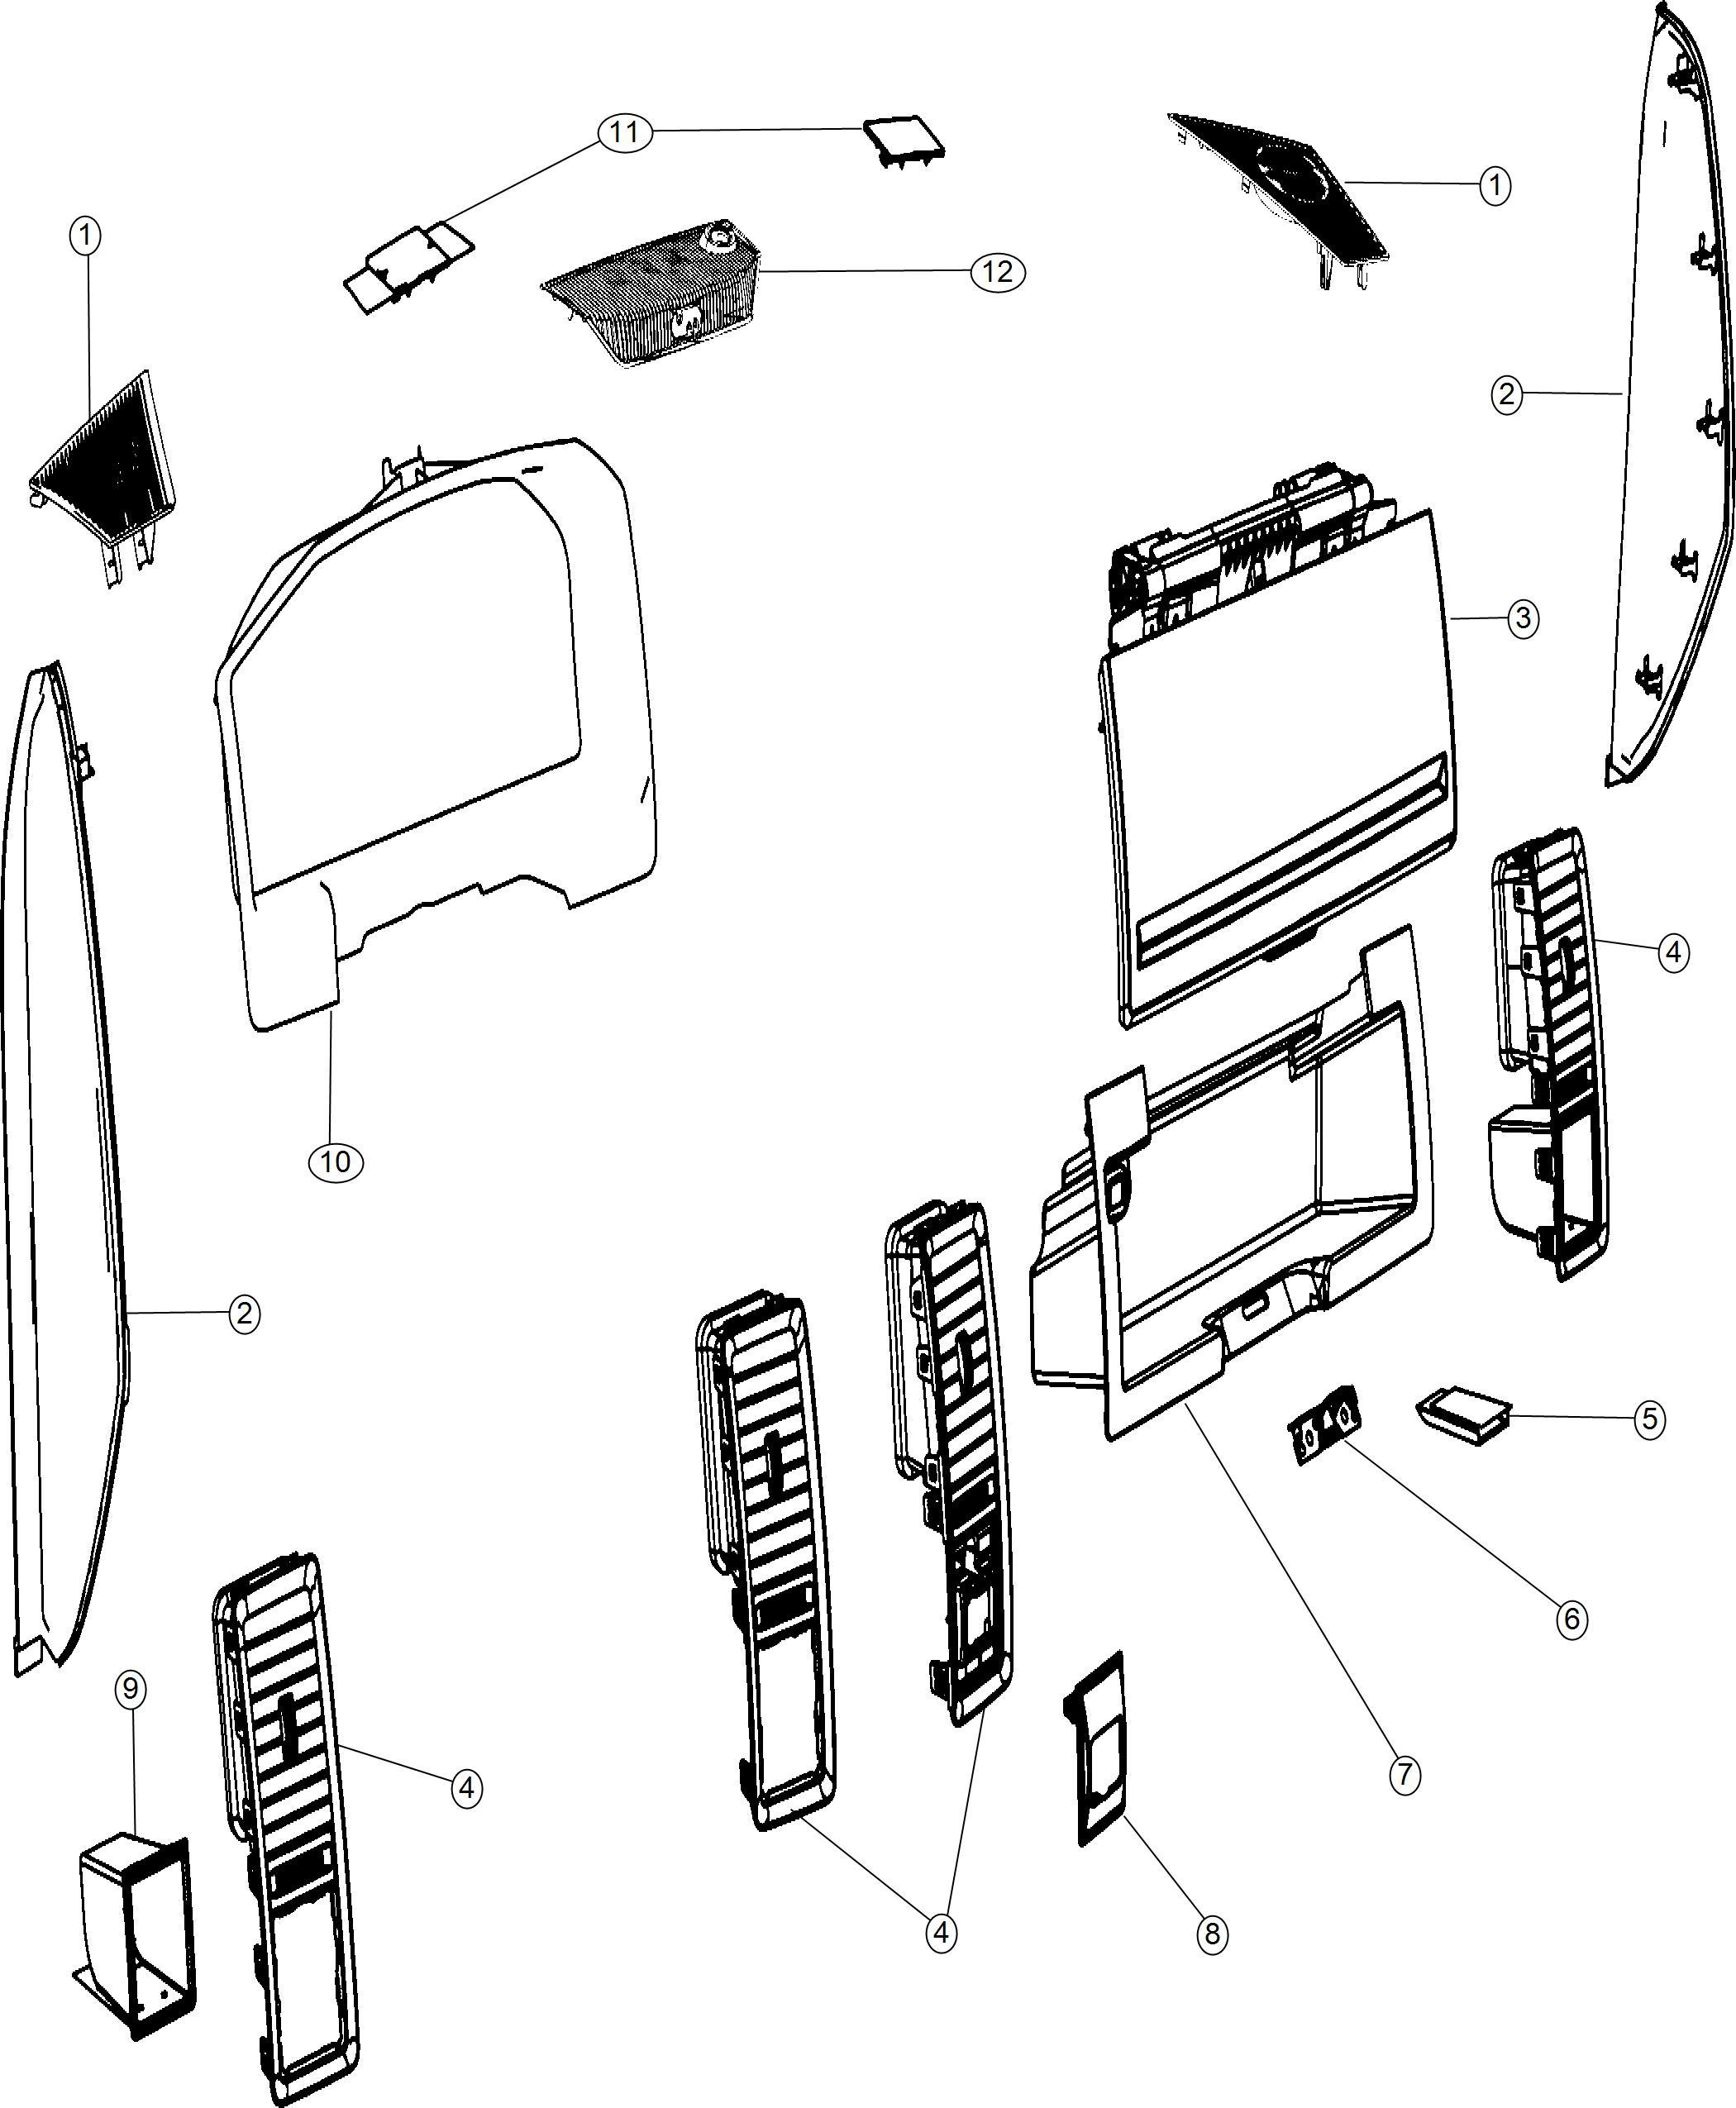 Ram Bezel Instrument Cluster Trim No Description